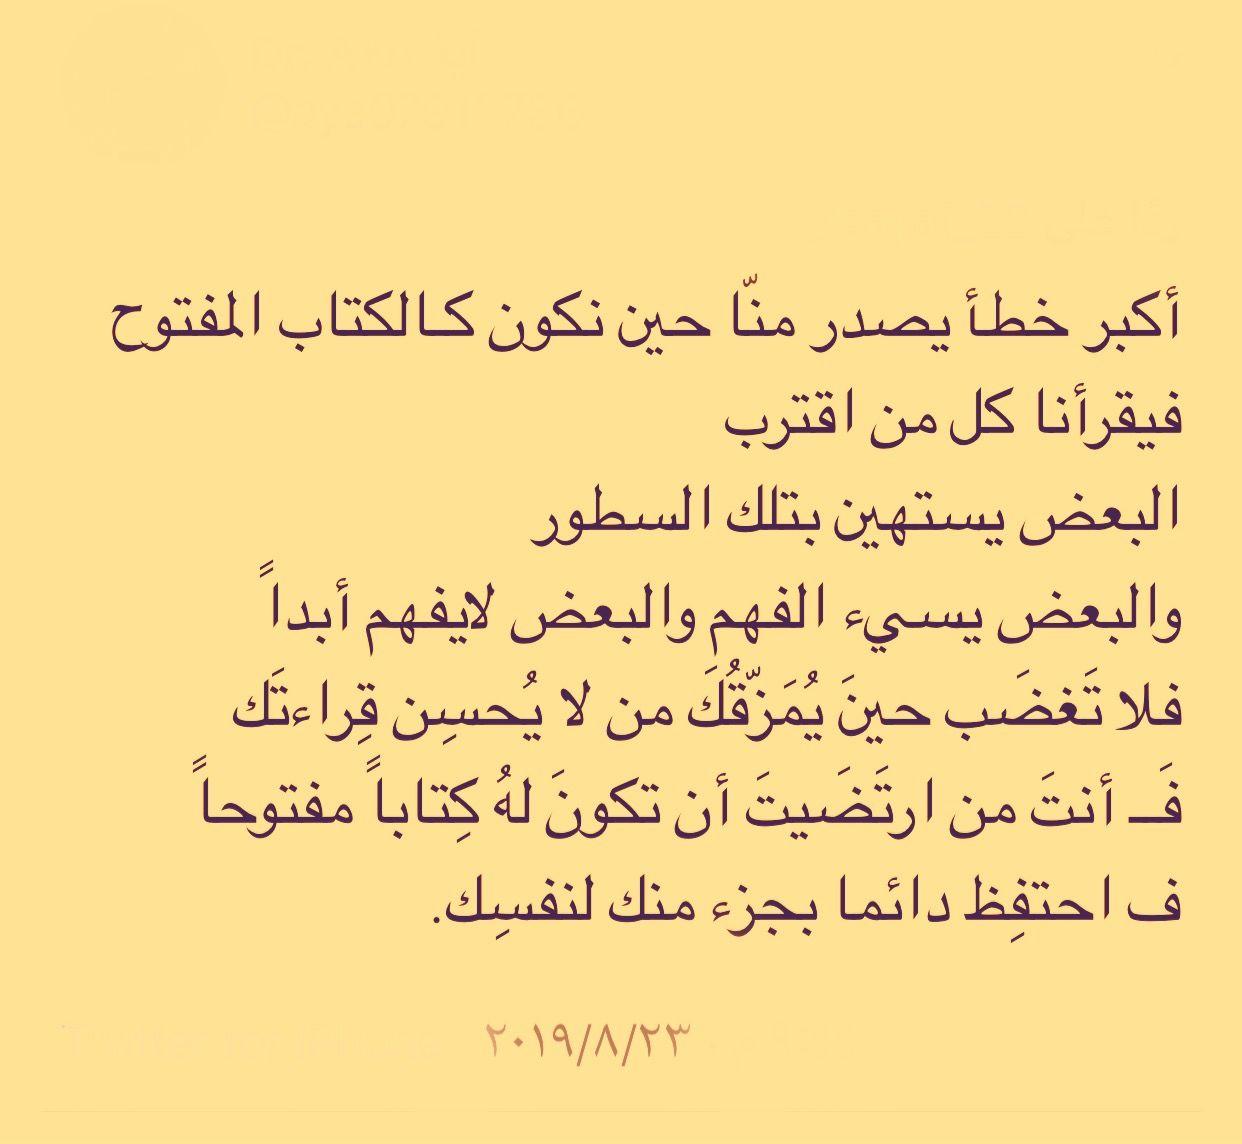 اقتباس Arabic Calligraphy Calligraphy